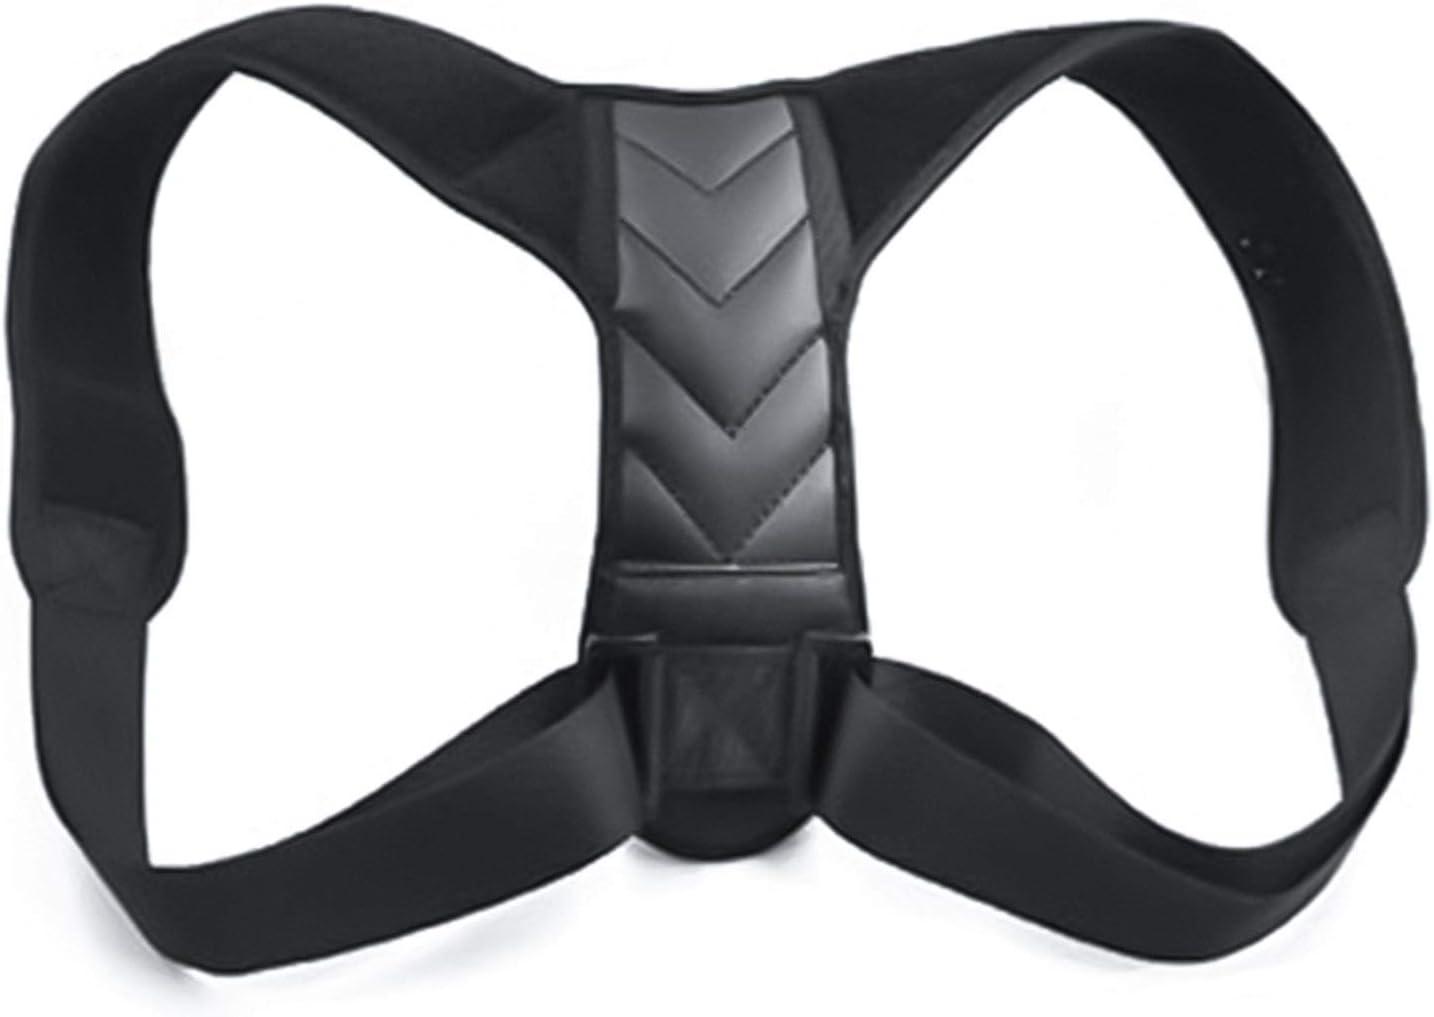 Max Max 68% OFF 57% OFF HELLEN Adjustable Posture Corrector Brace Back Belt Cors Support